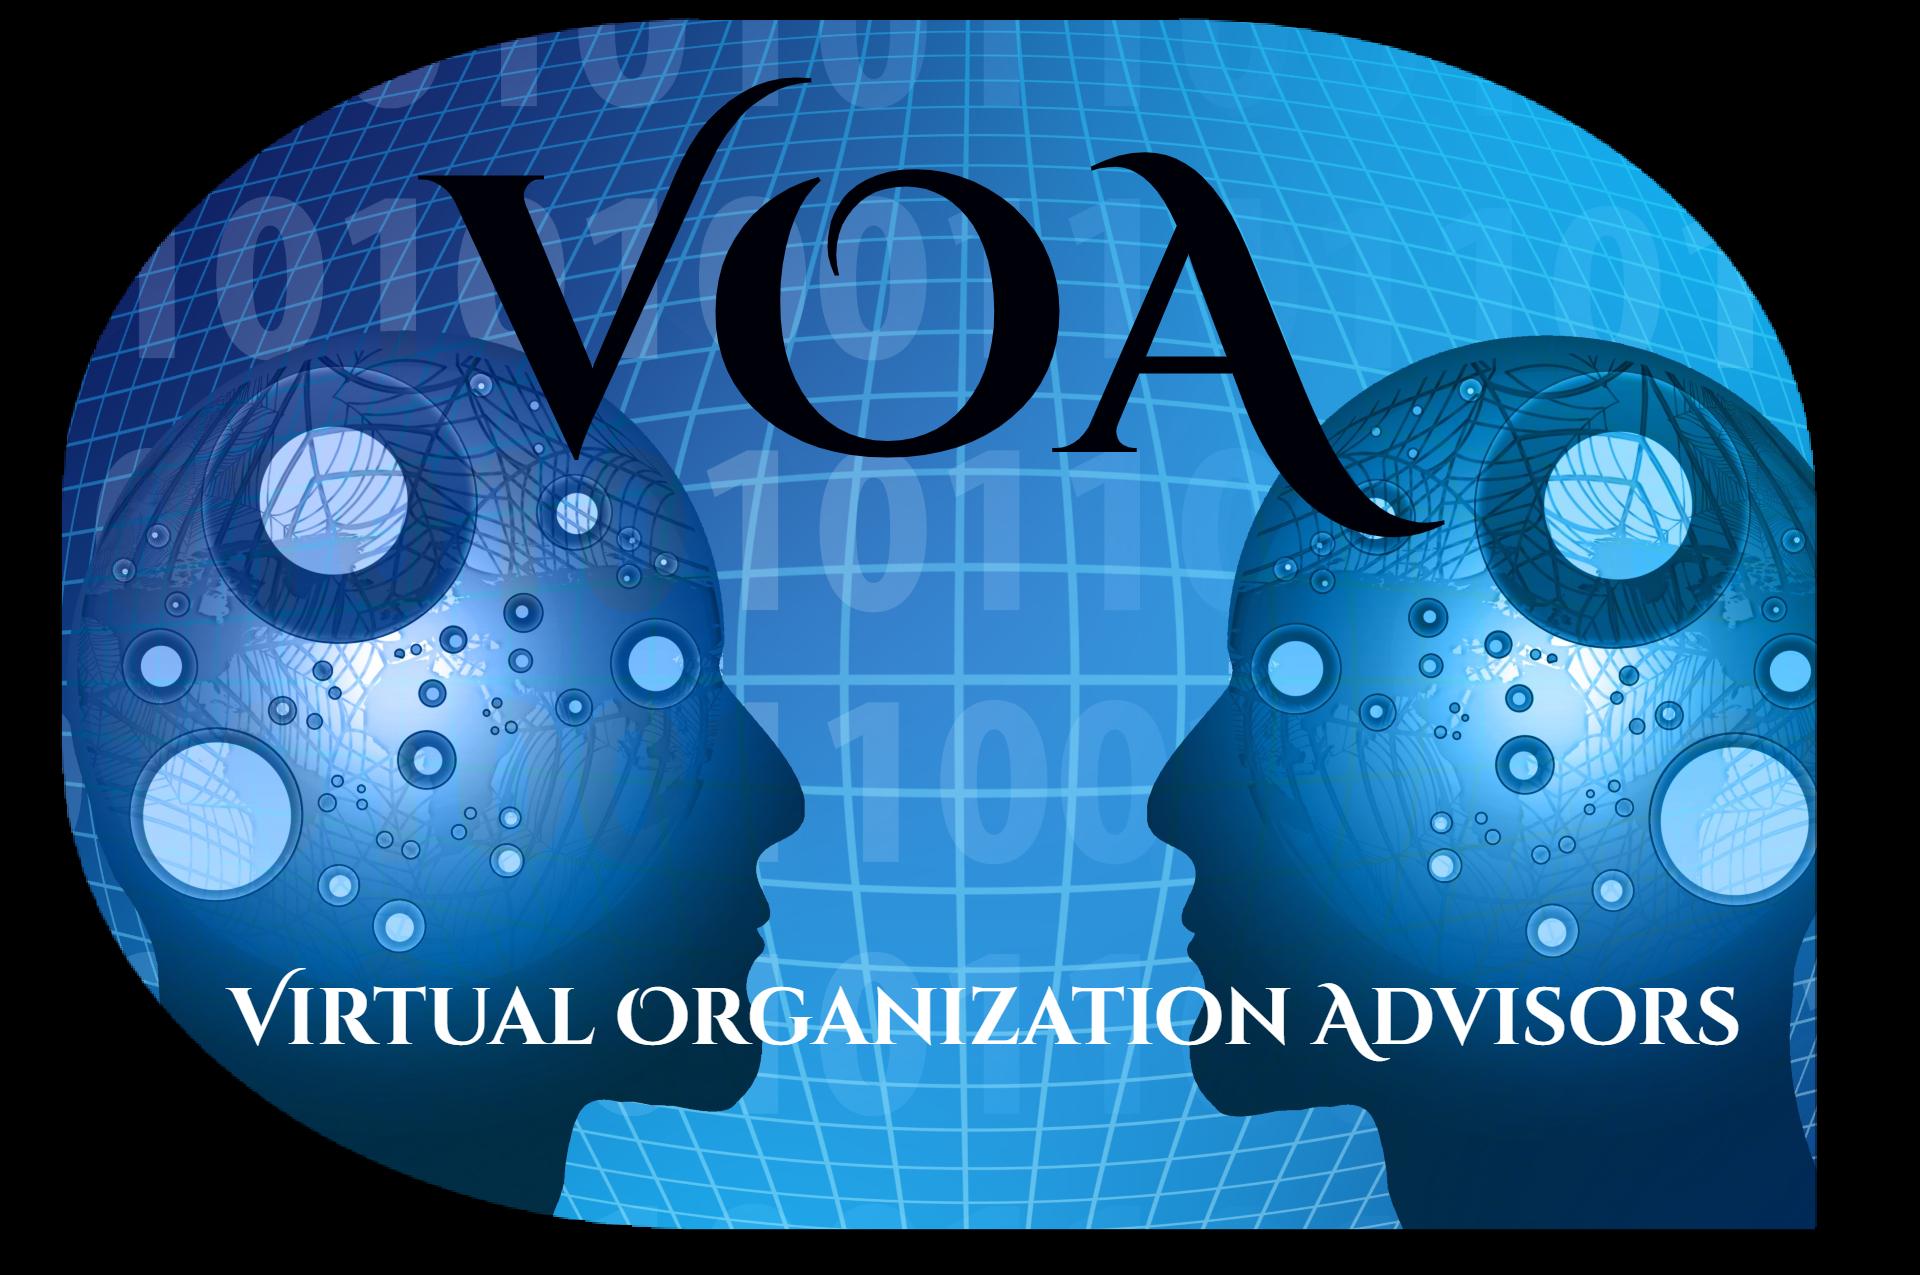 VIRTUAL ORGANIZATION ADVISORS